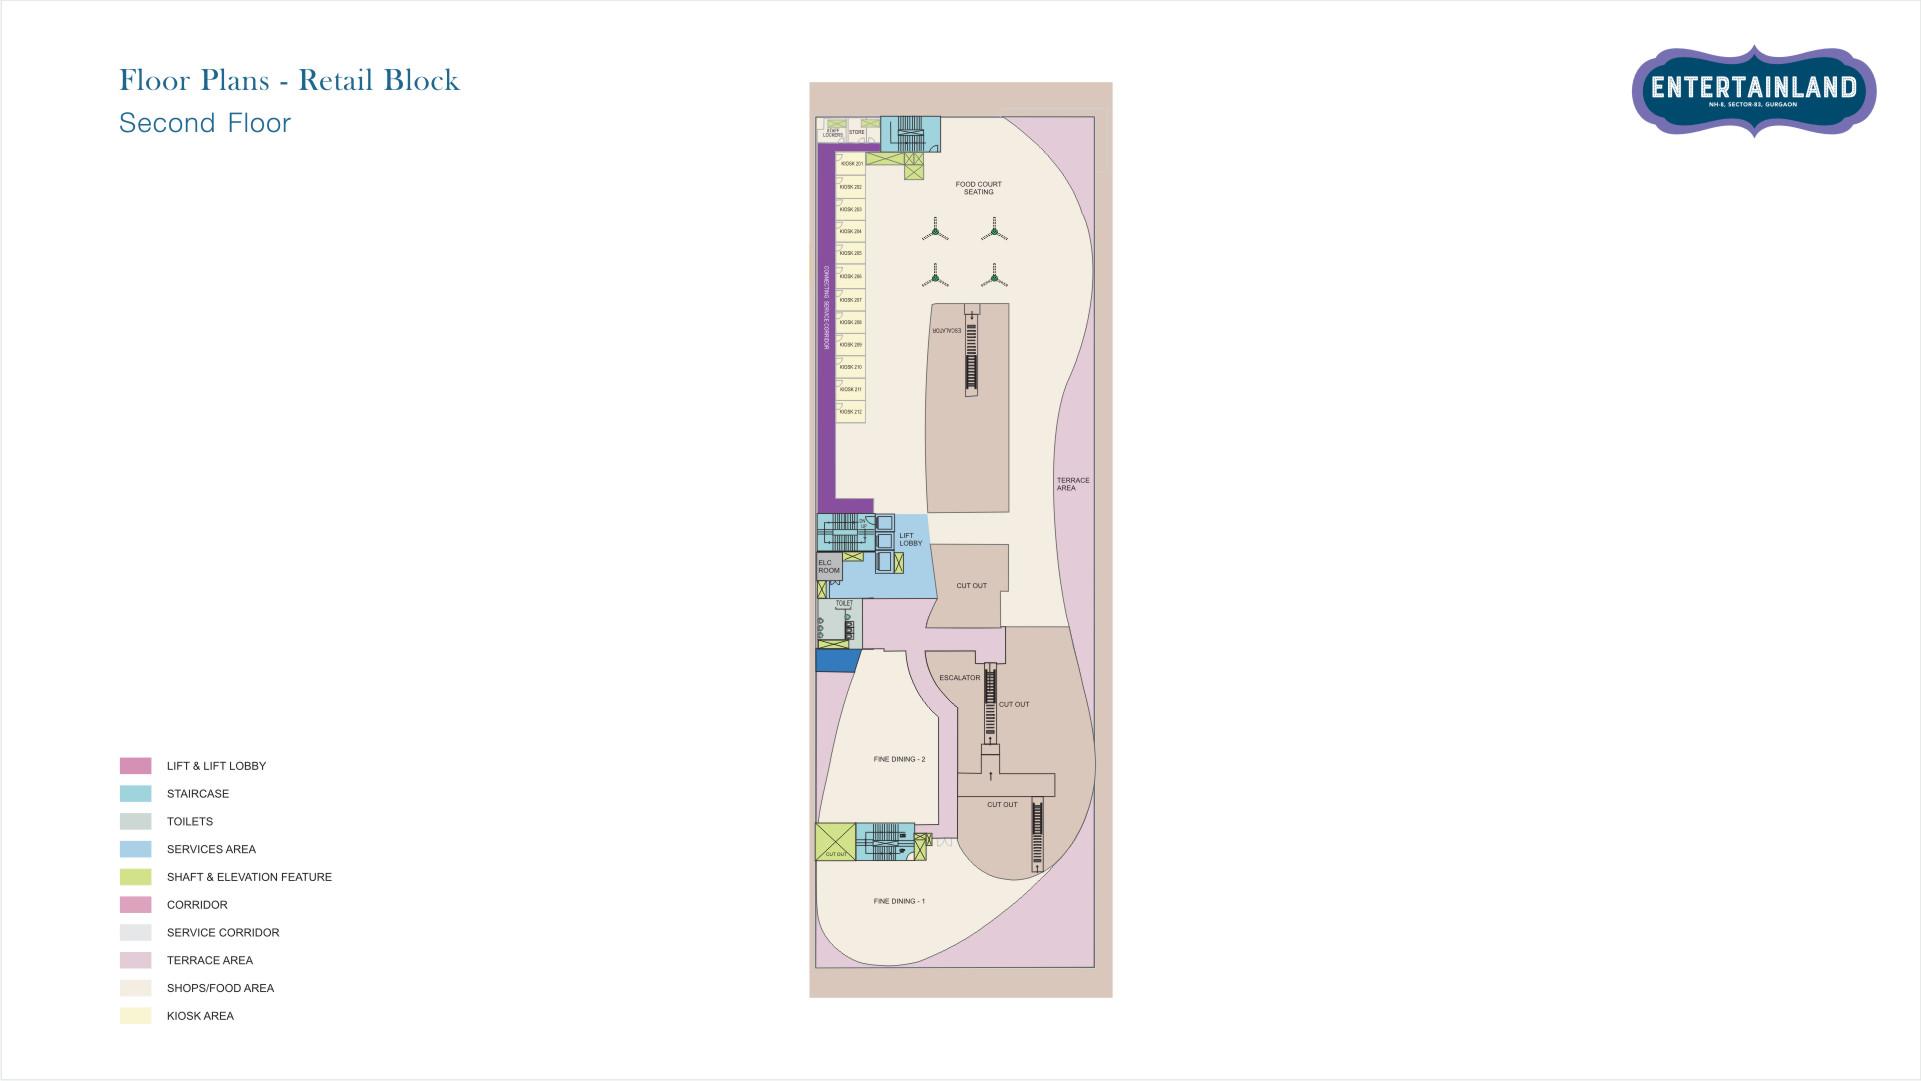 Entertainland Floor Plan 3